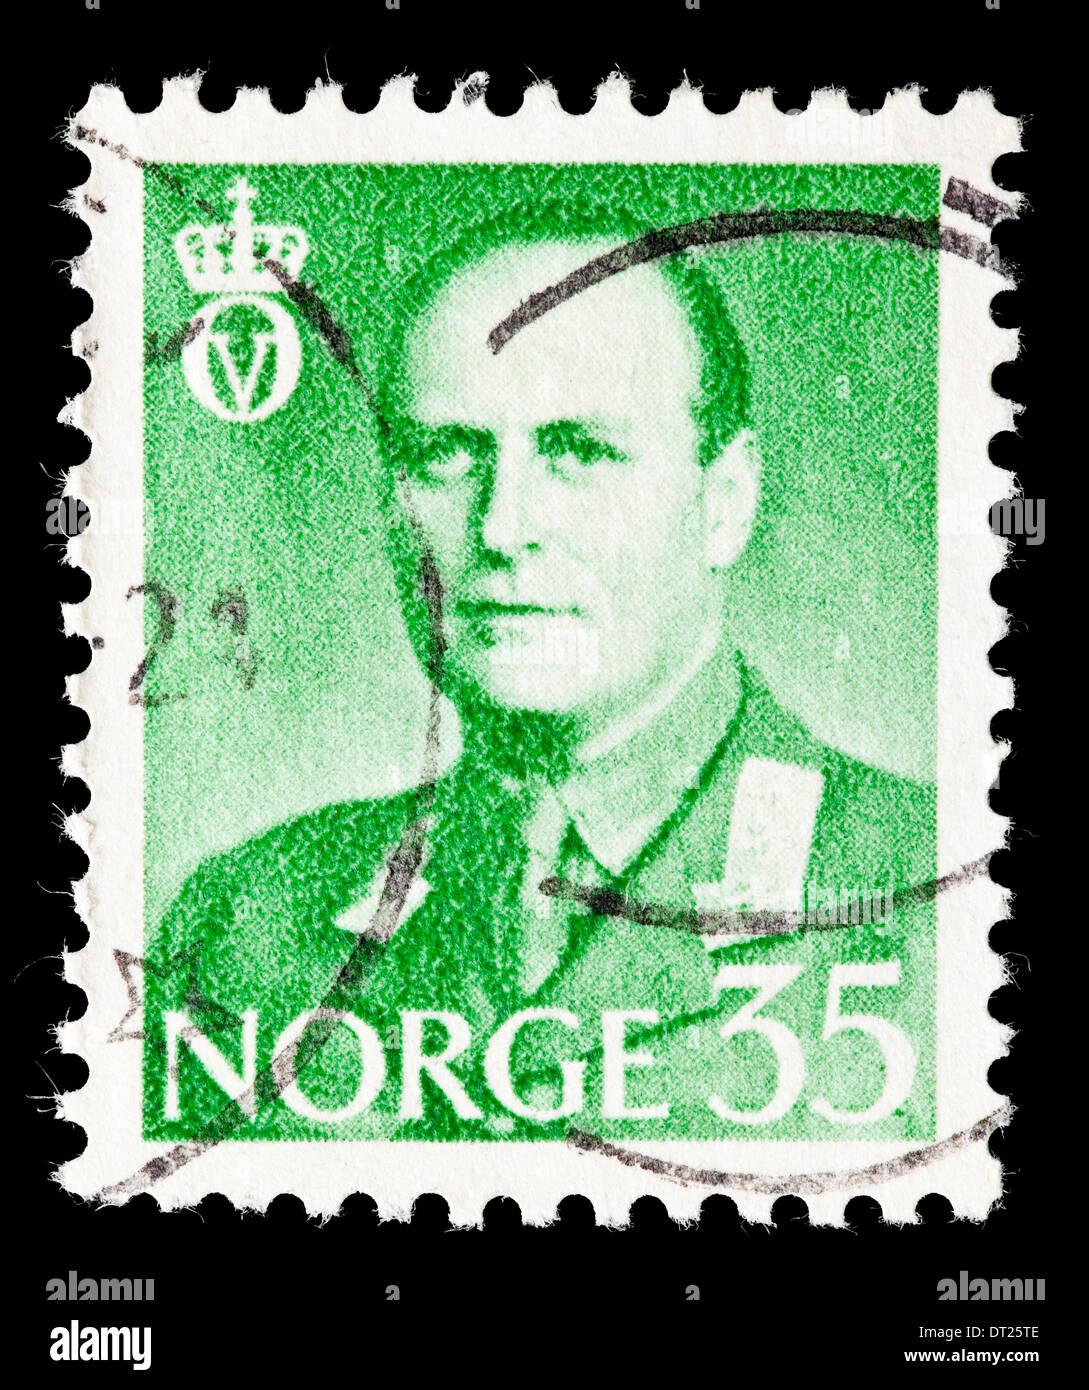 King Of Norway 1957 1991